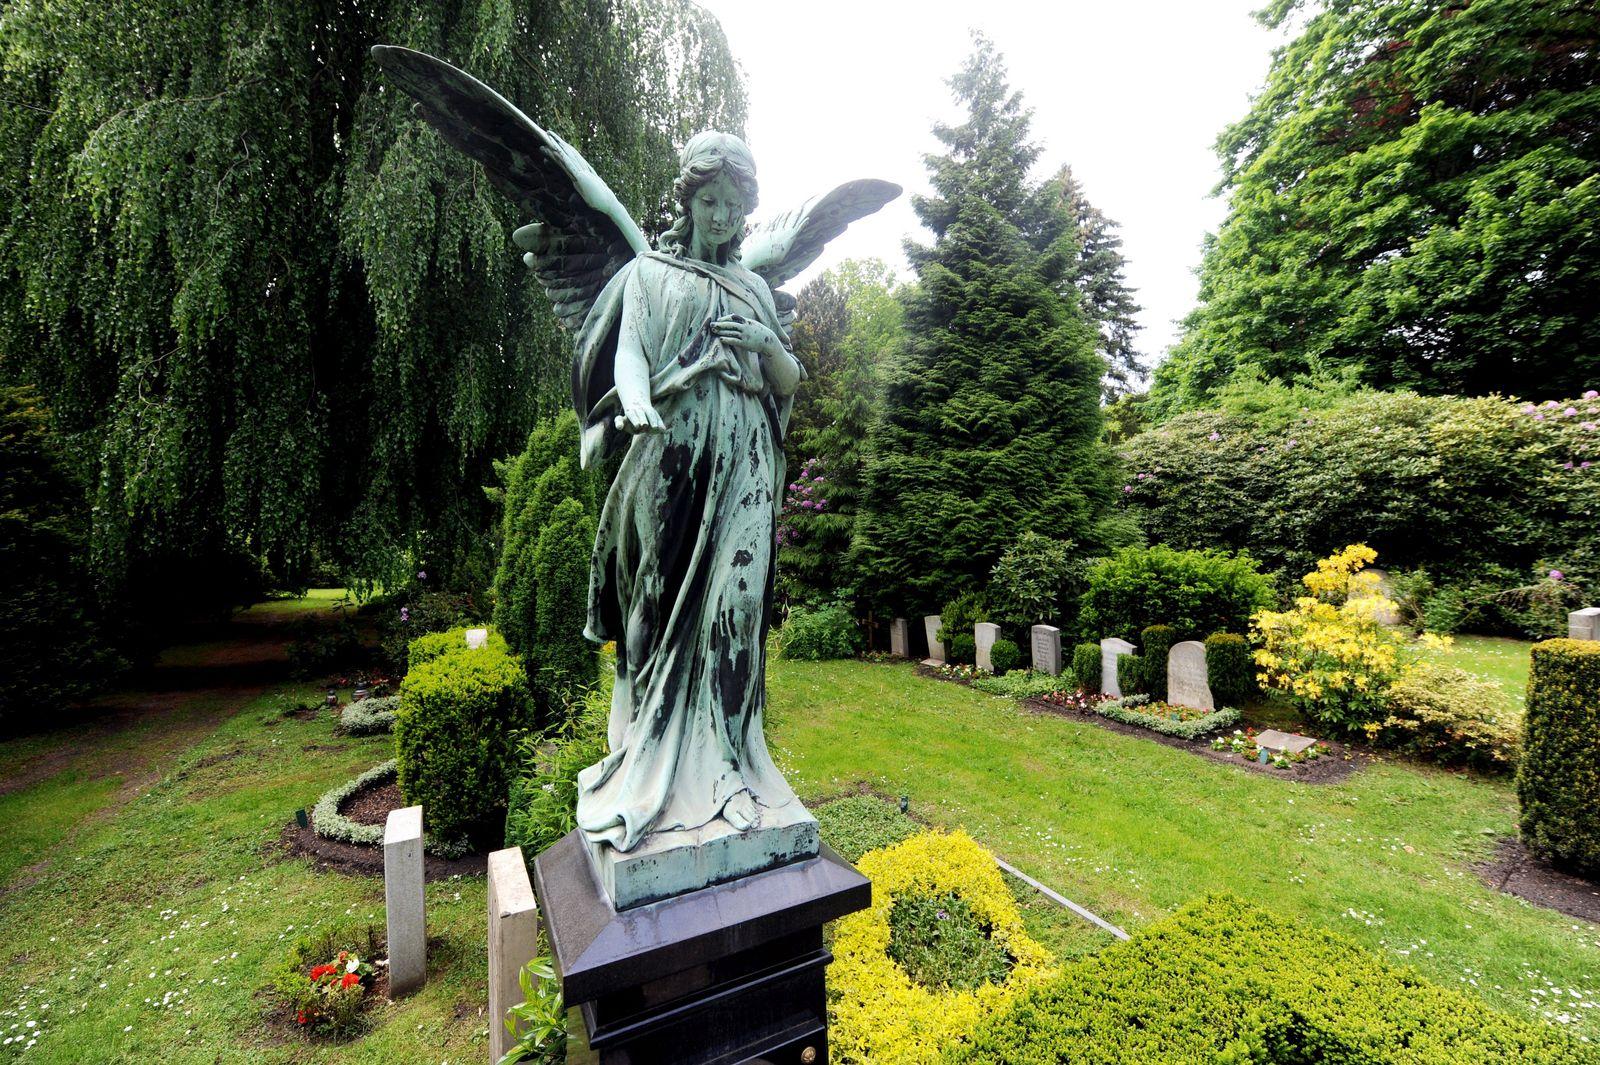 Friedhof Ohlsdorf in Hamburg